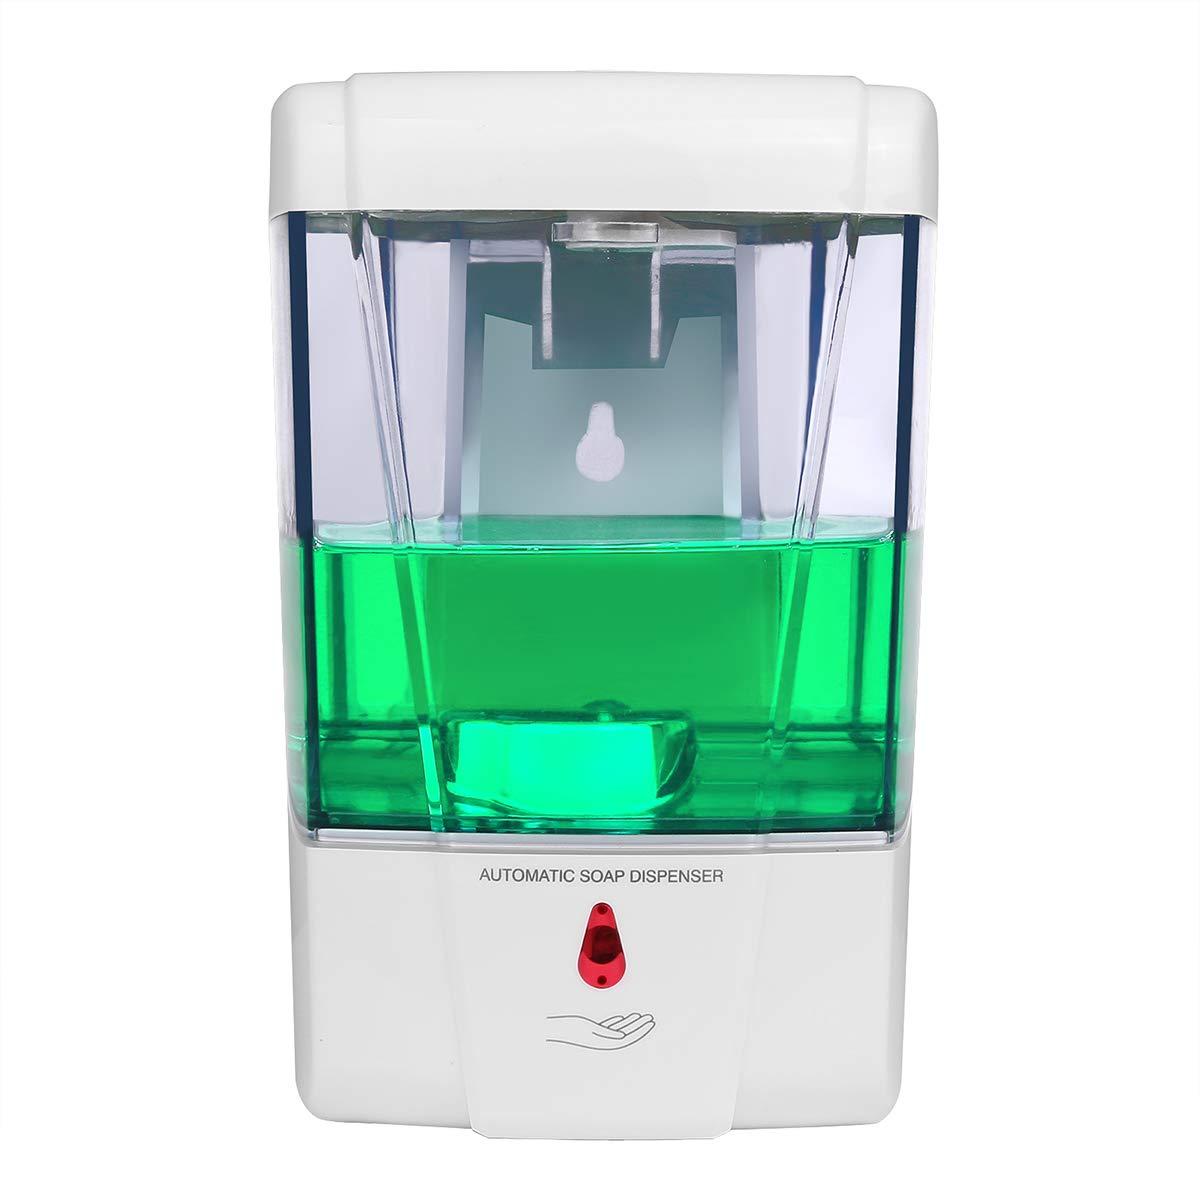 Nail Free 600ml Abs Automatic Liquid Soap Dispenser Wall Mounted Smart Sensor Shower Dispenser For Bathroom Washroom Liquid Soap Dispensers